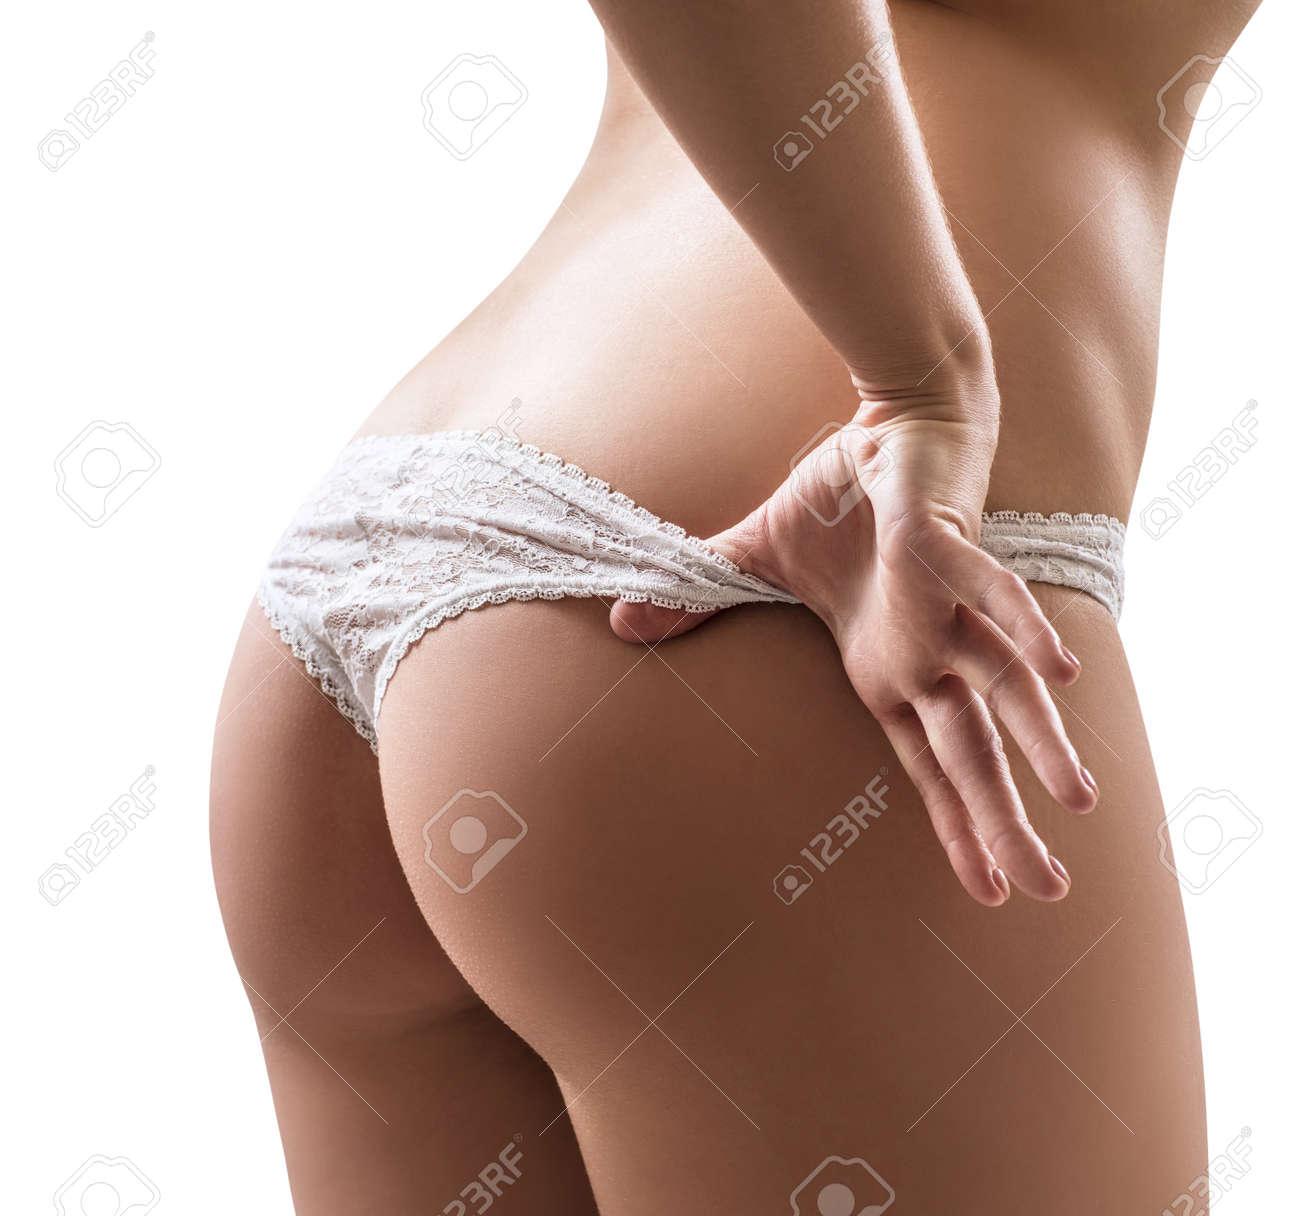 Her sexy panties